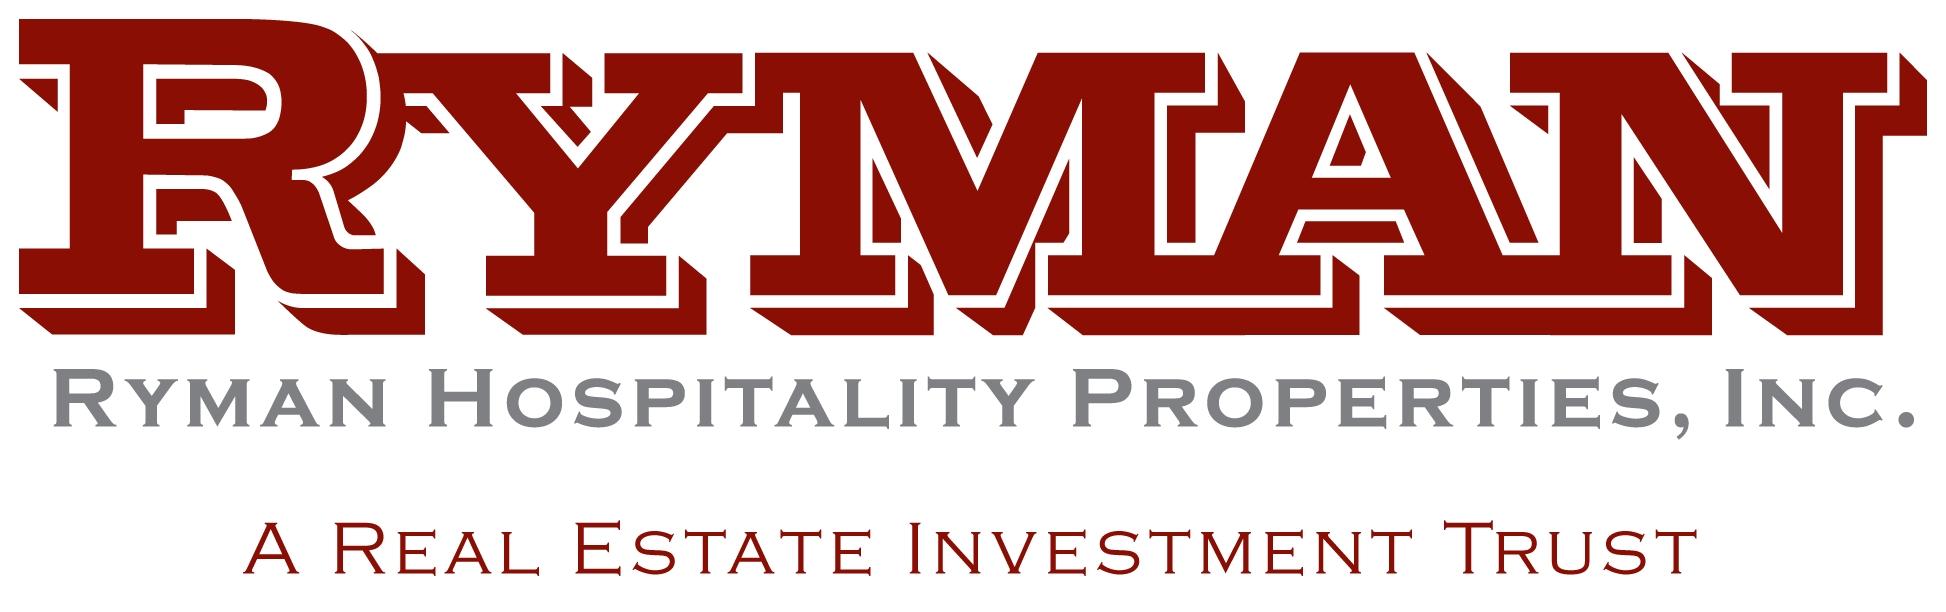 Ryman Hospitality Properties Inc